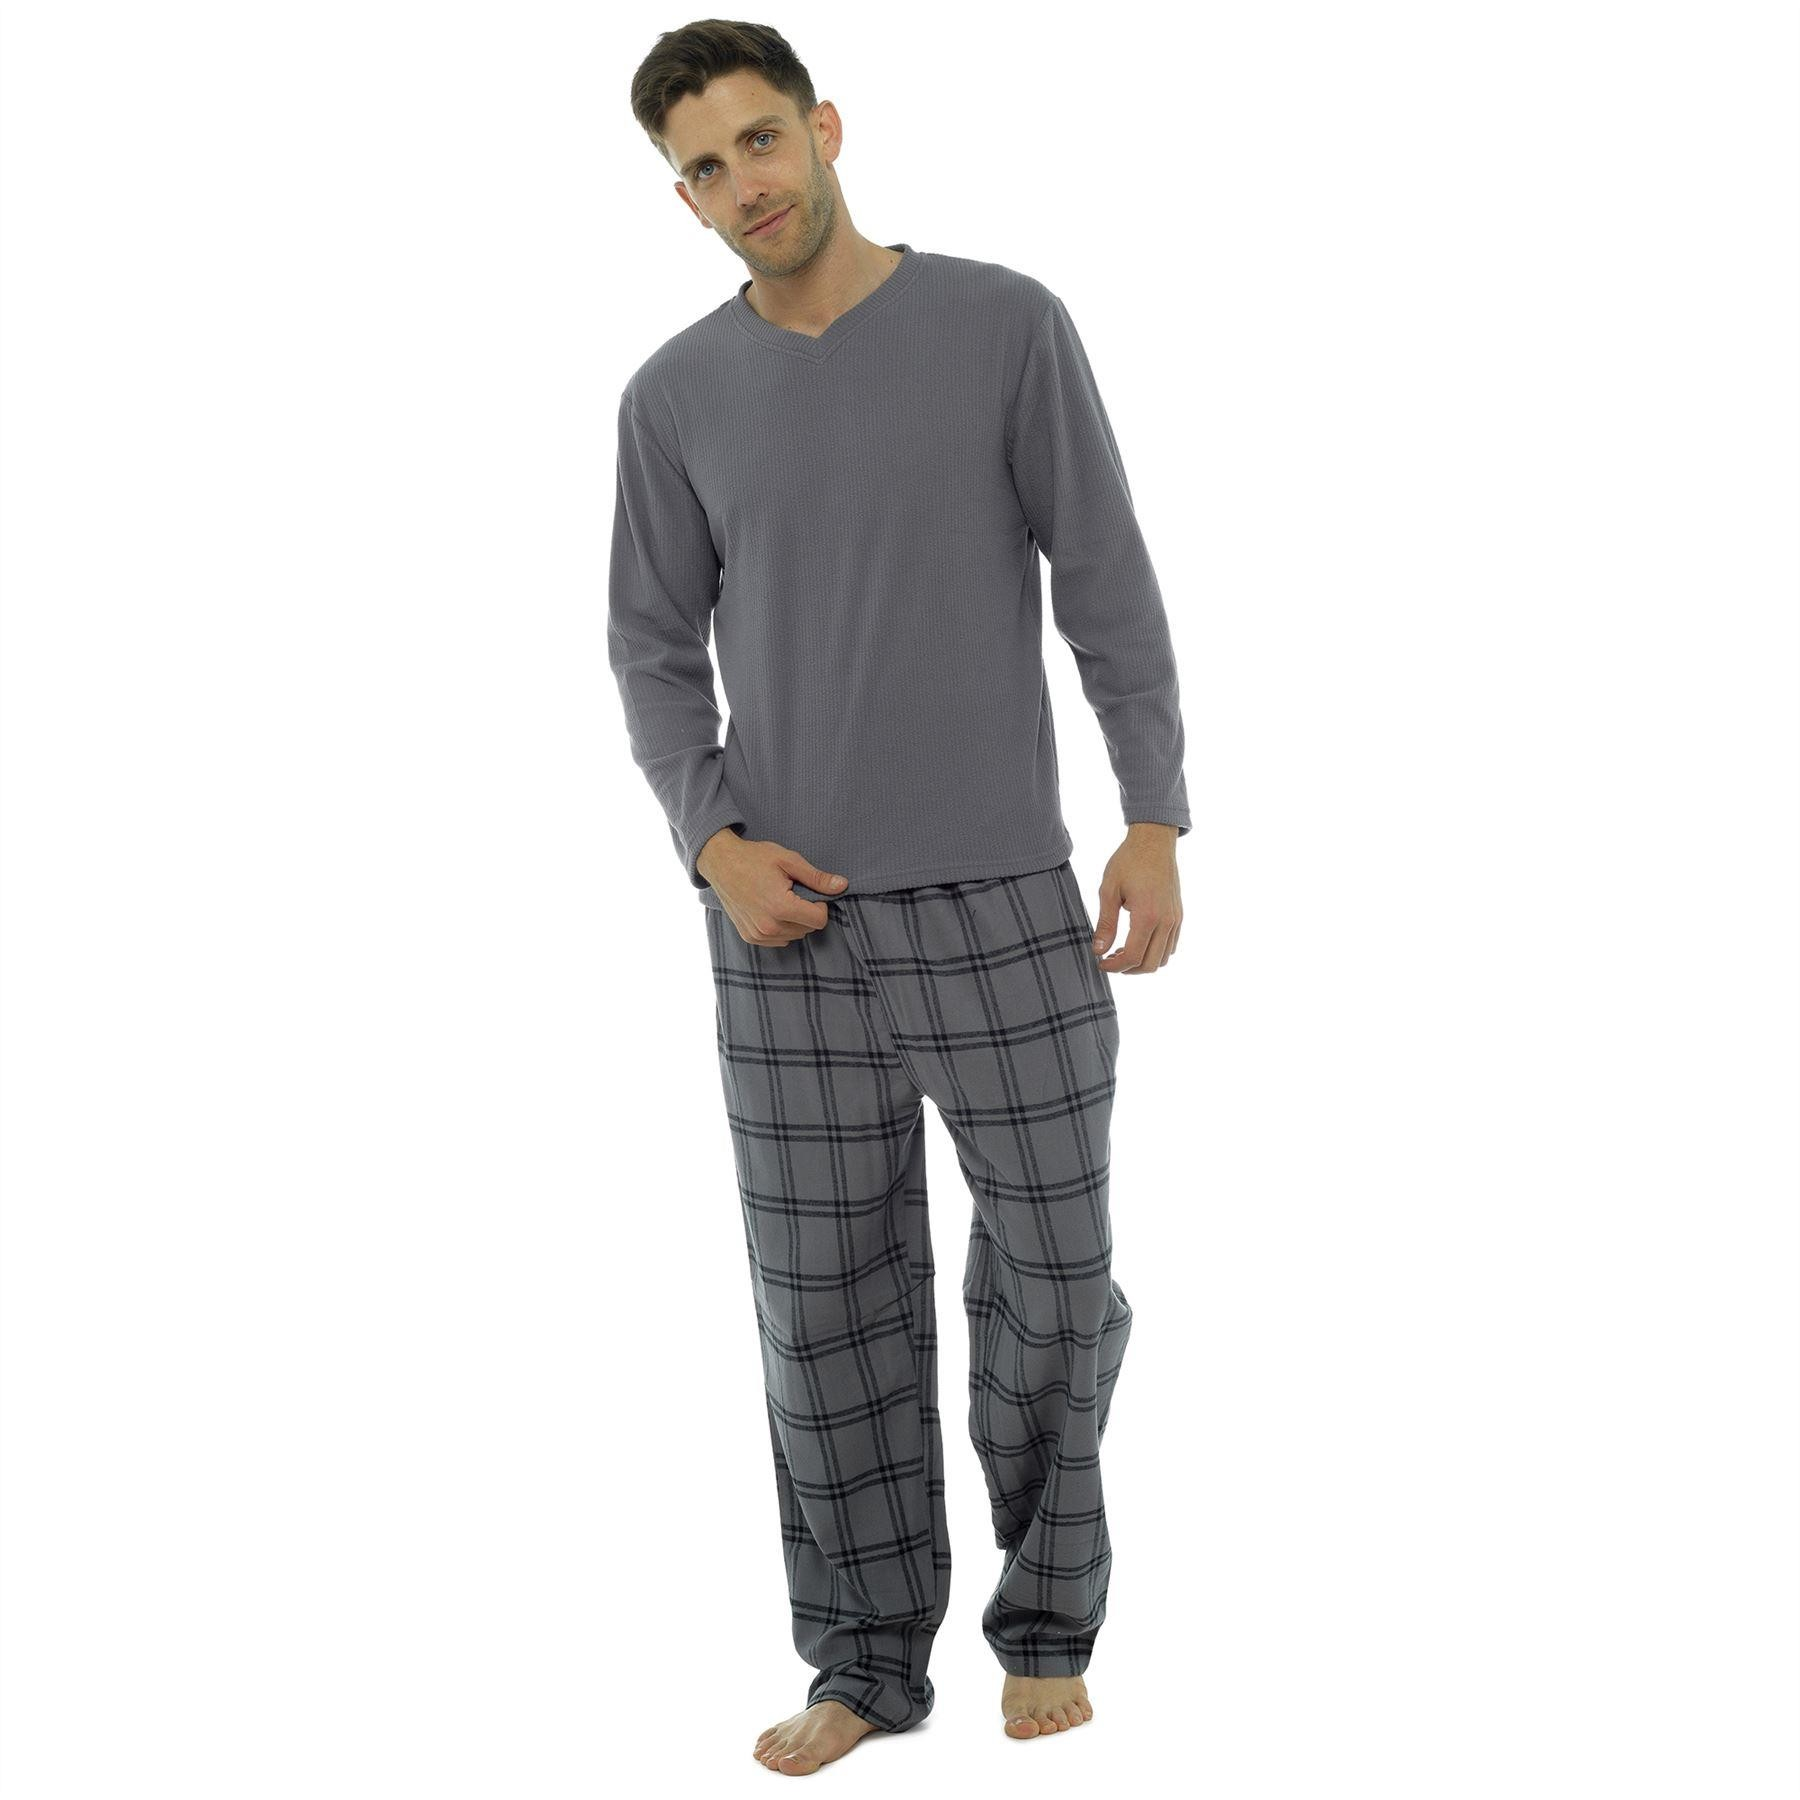 Tom Franks Mens Fleece/Flannel Check Pyjama Set - Grey